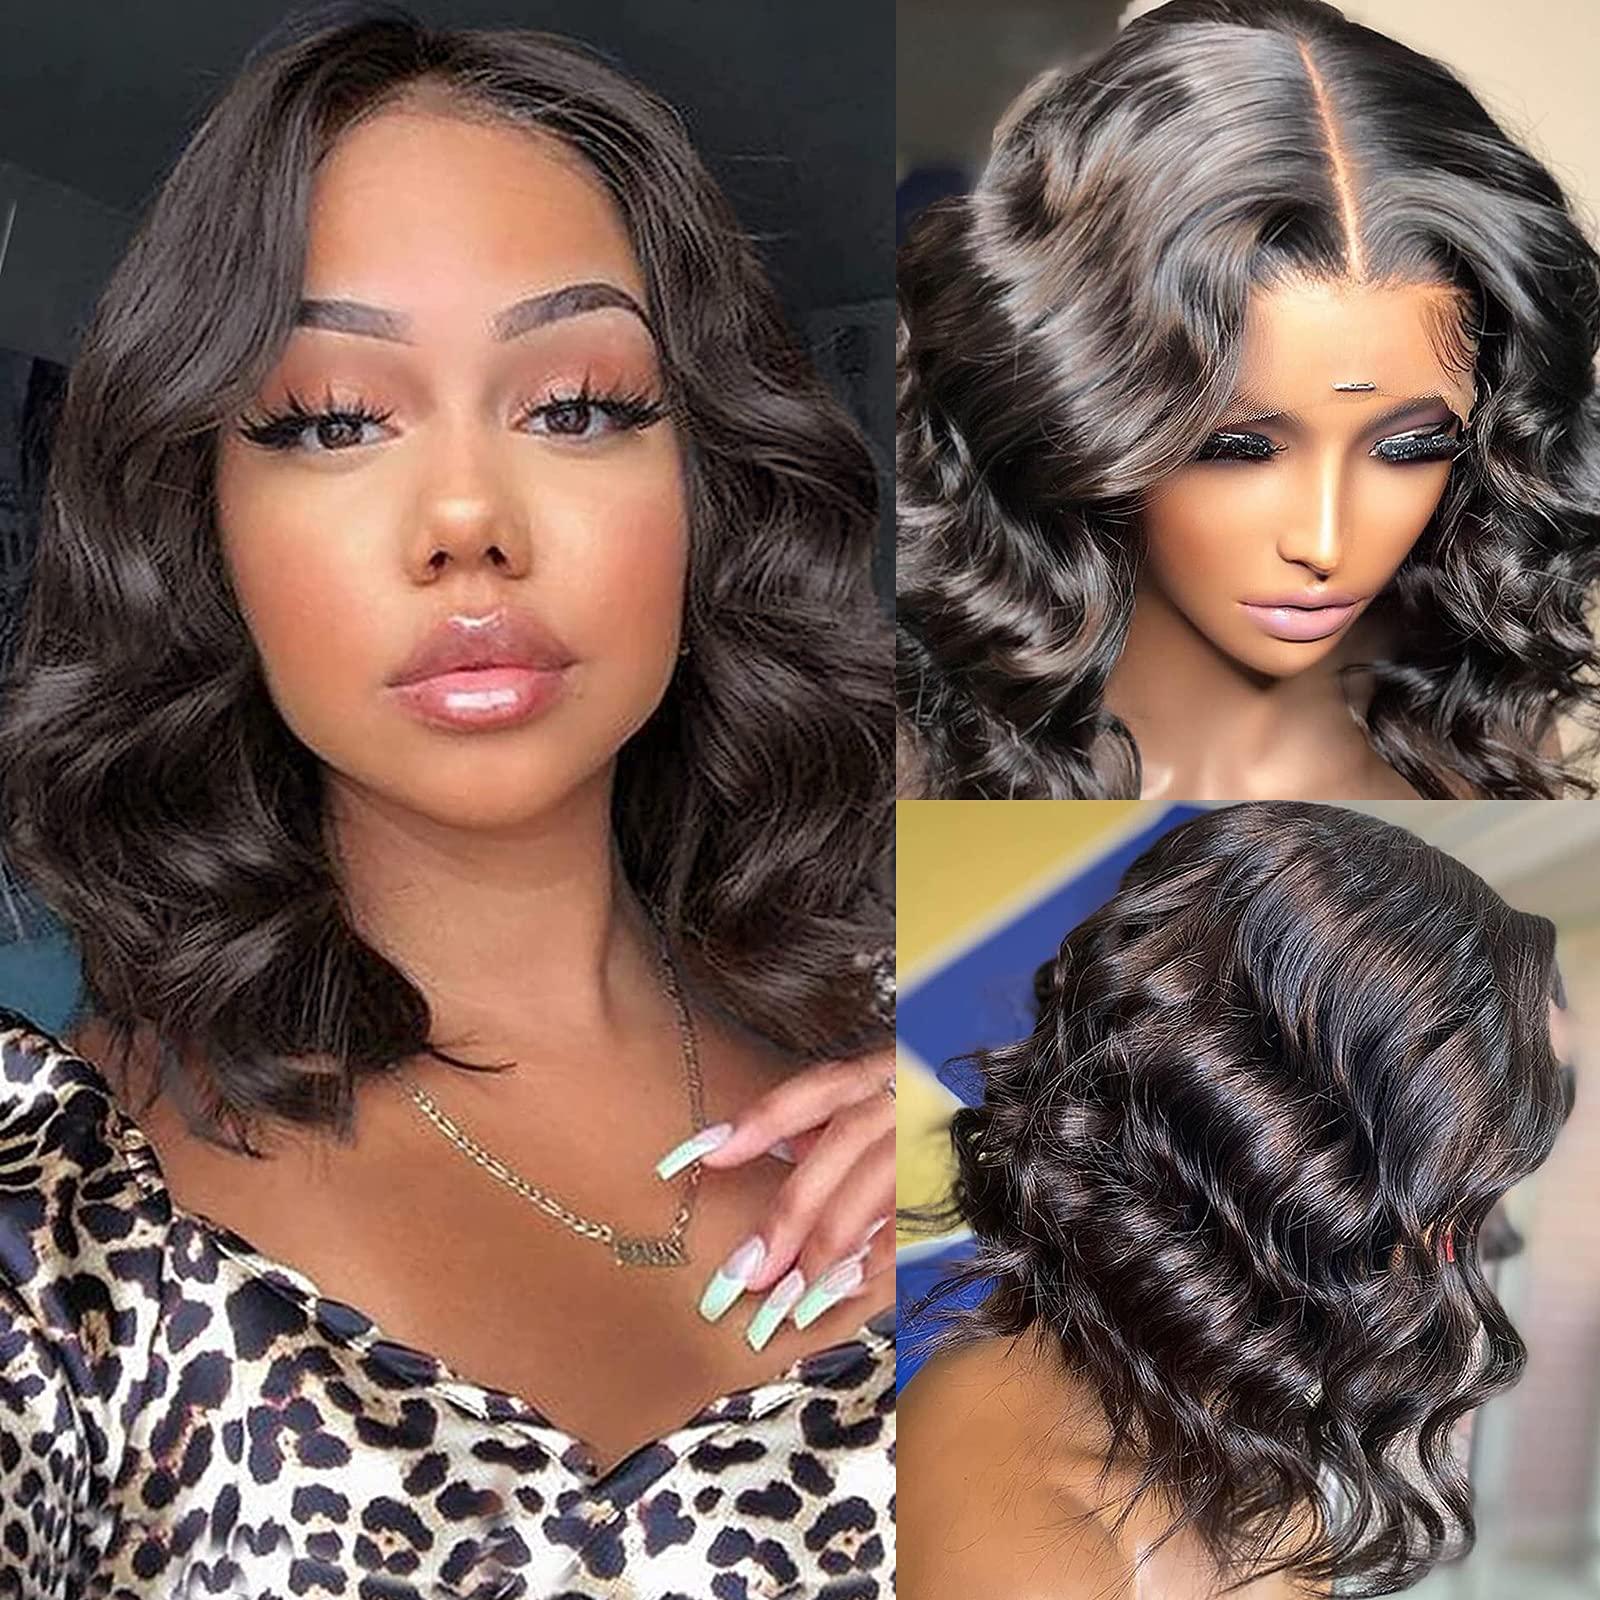 B-fashion Bob Wigs Human Hair – Body Wave Lace Front Wigs Human